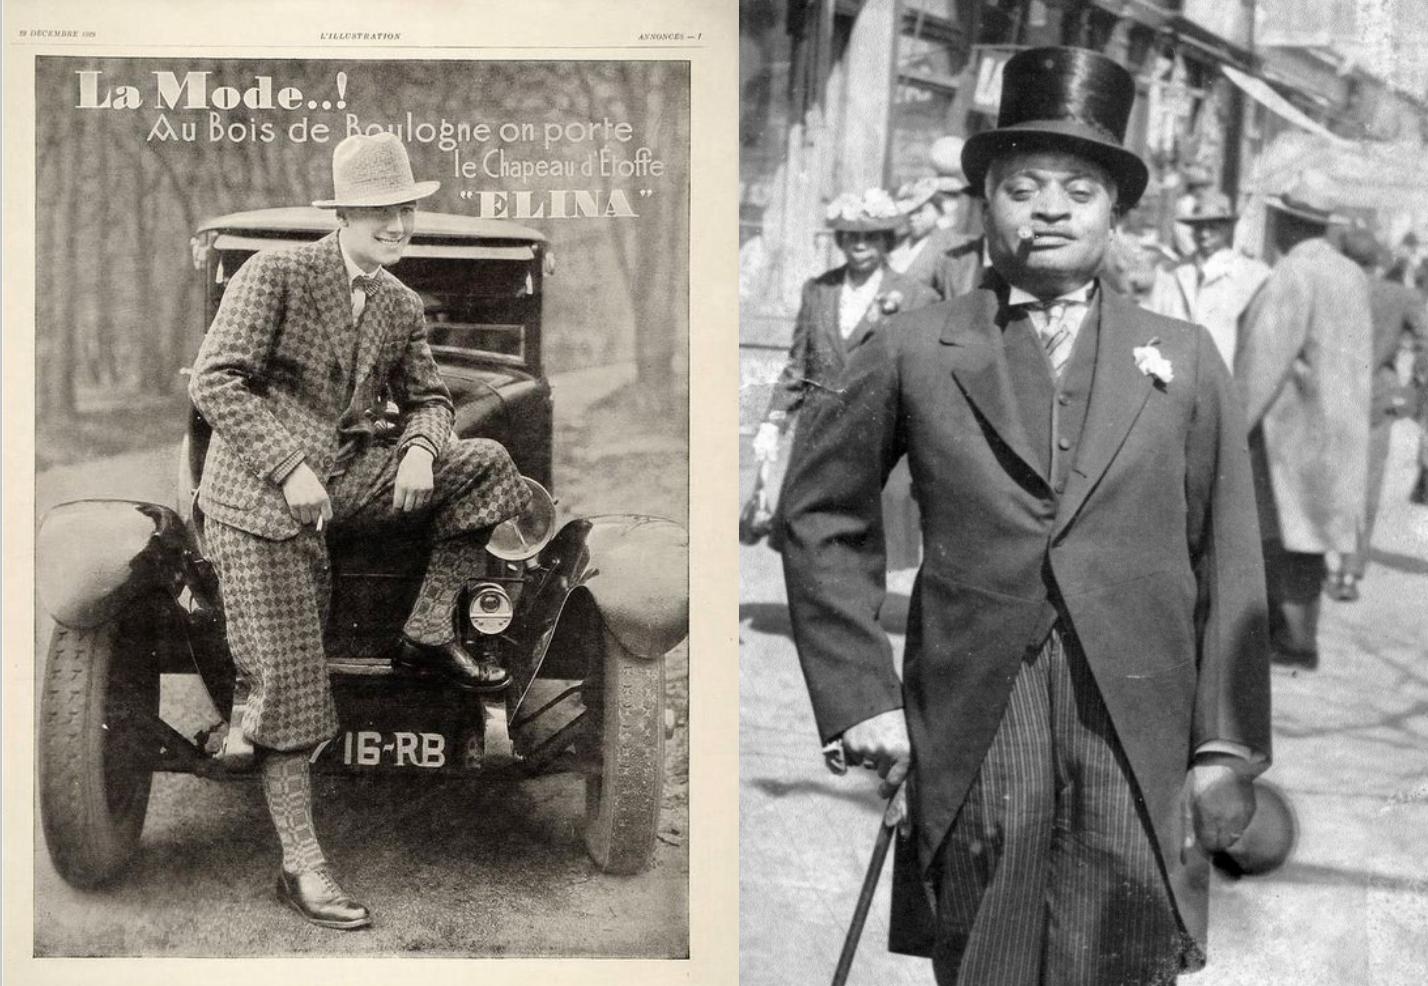 Hipster der Roaring Twenties: der Dandy Look Frauenband